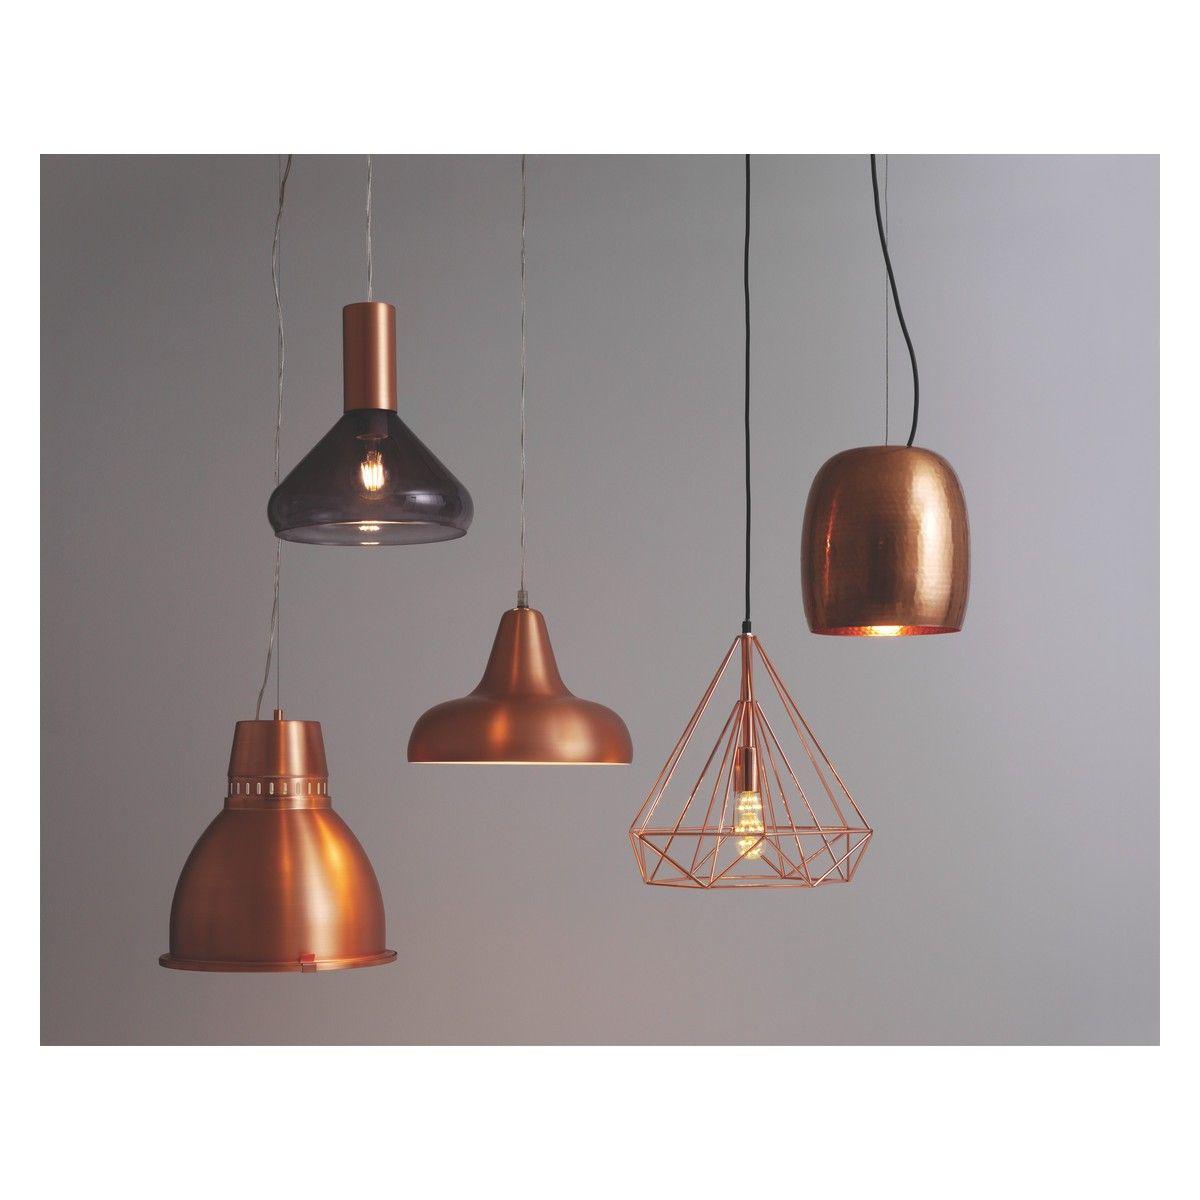 Marteau copper mini metal ceiling light copper accessories solid marteau copper mini metal ceiling light buy now at habitat uk aloadofball Choice Image